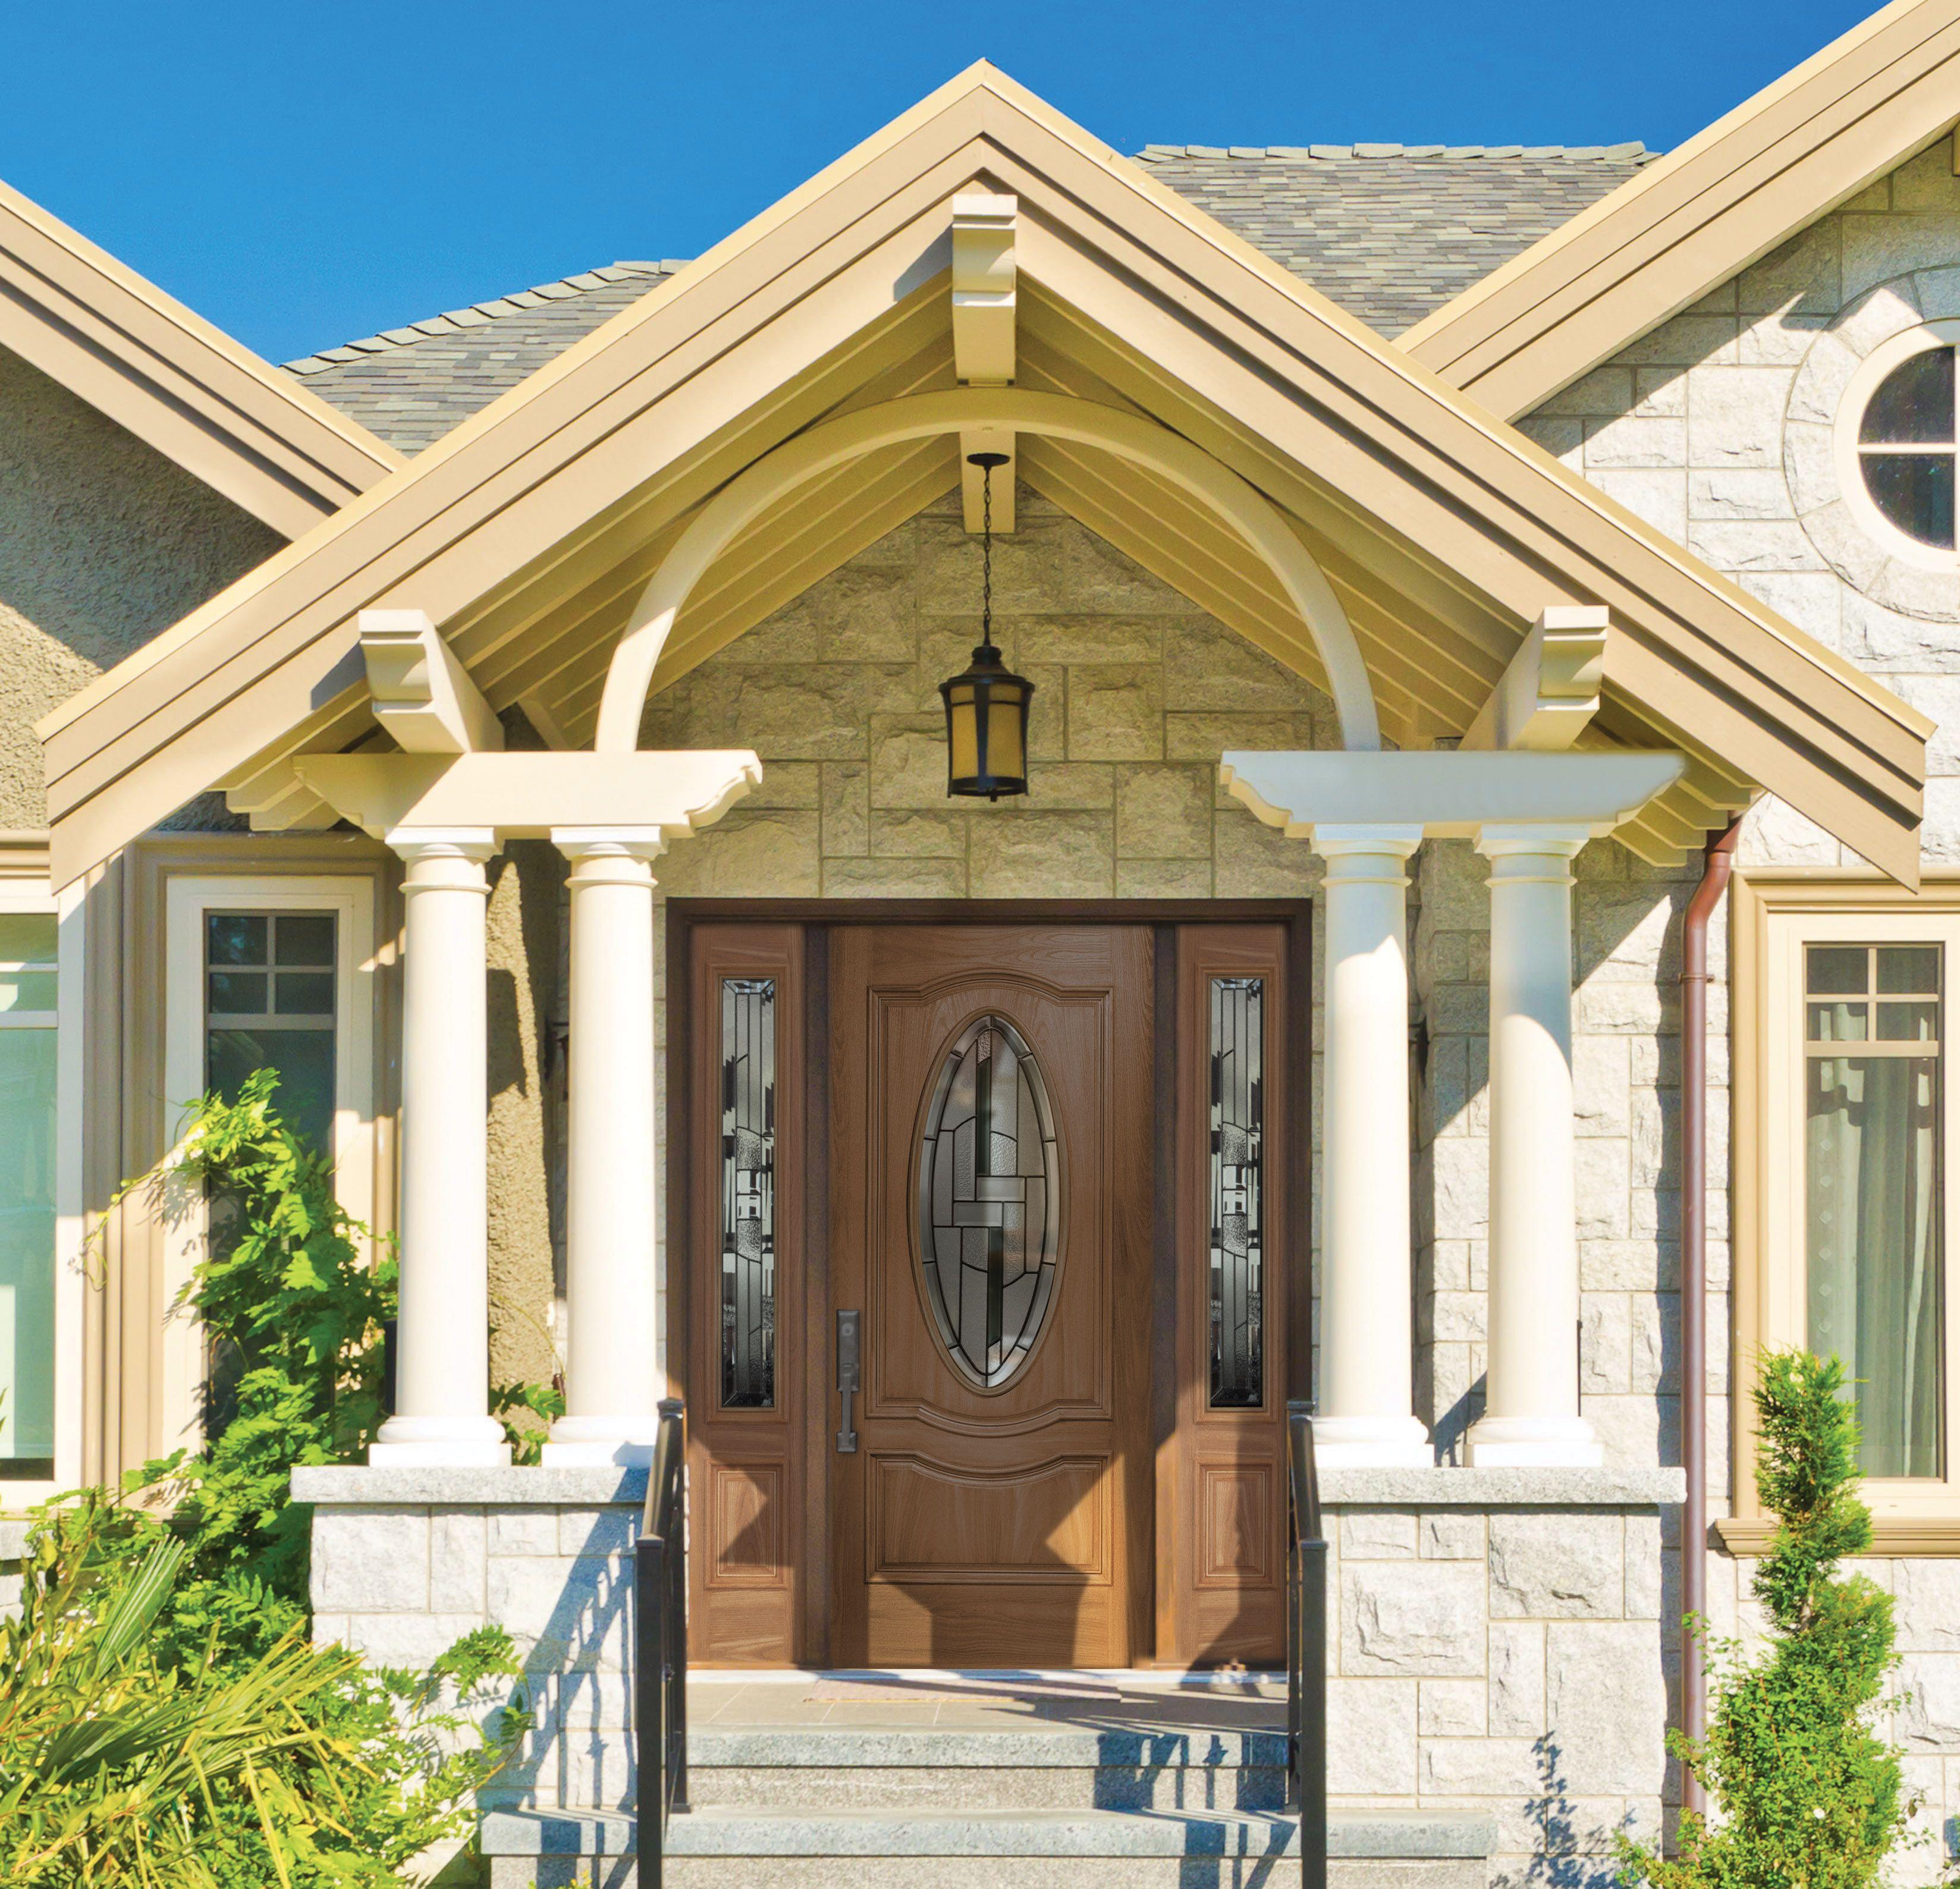 Exterior: The Barrington Oak Fiberglass Textured Door With ¾ Oval